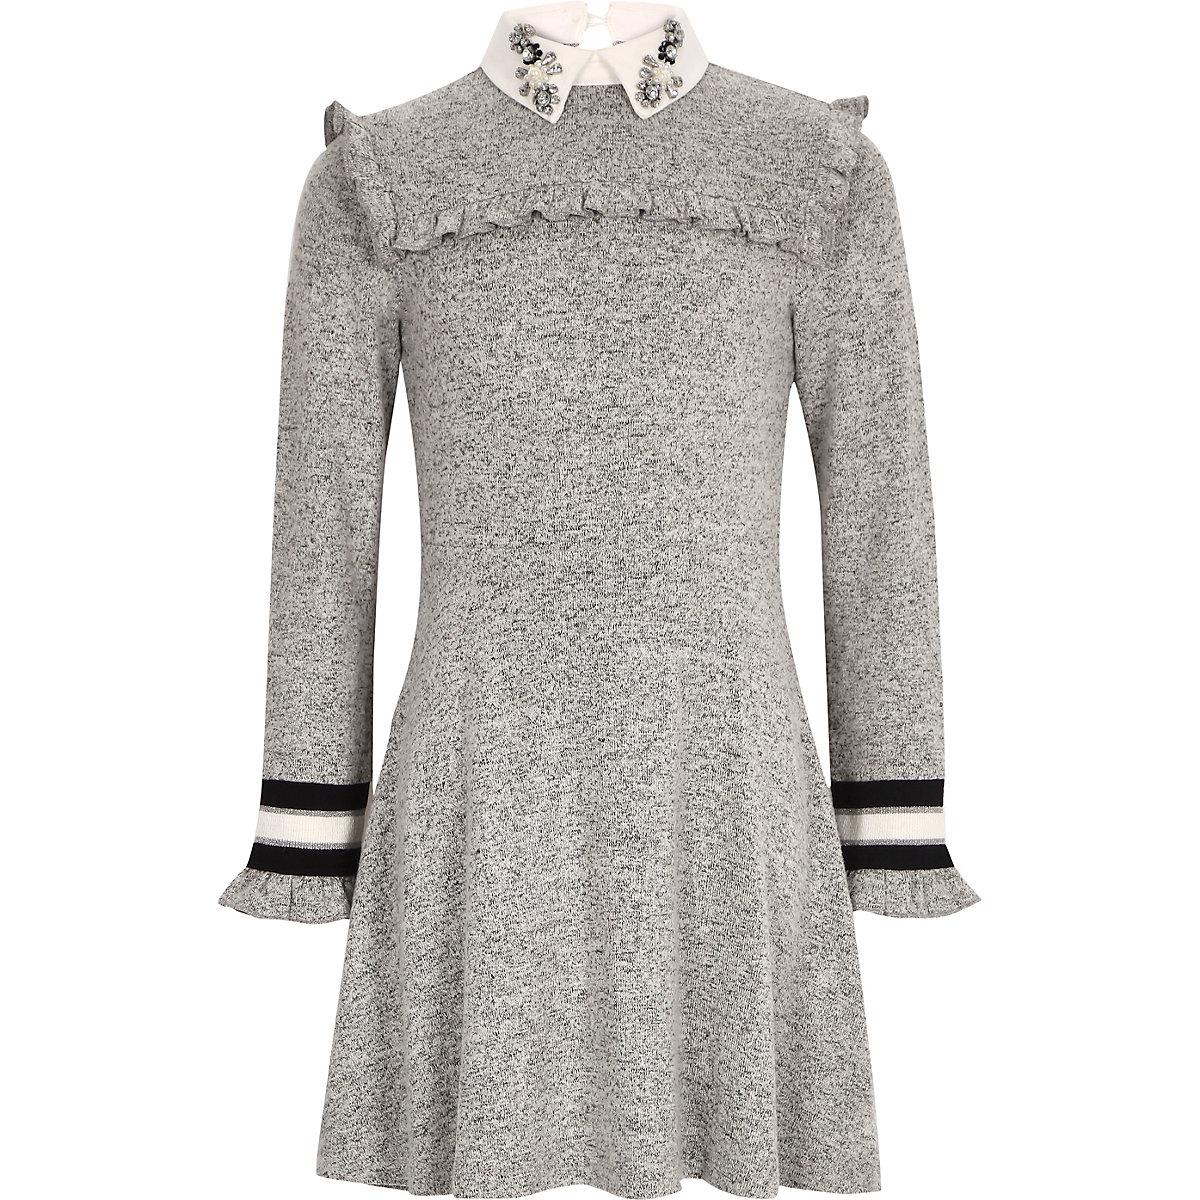 Girls grey embellished collar dress